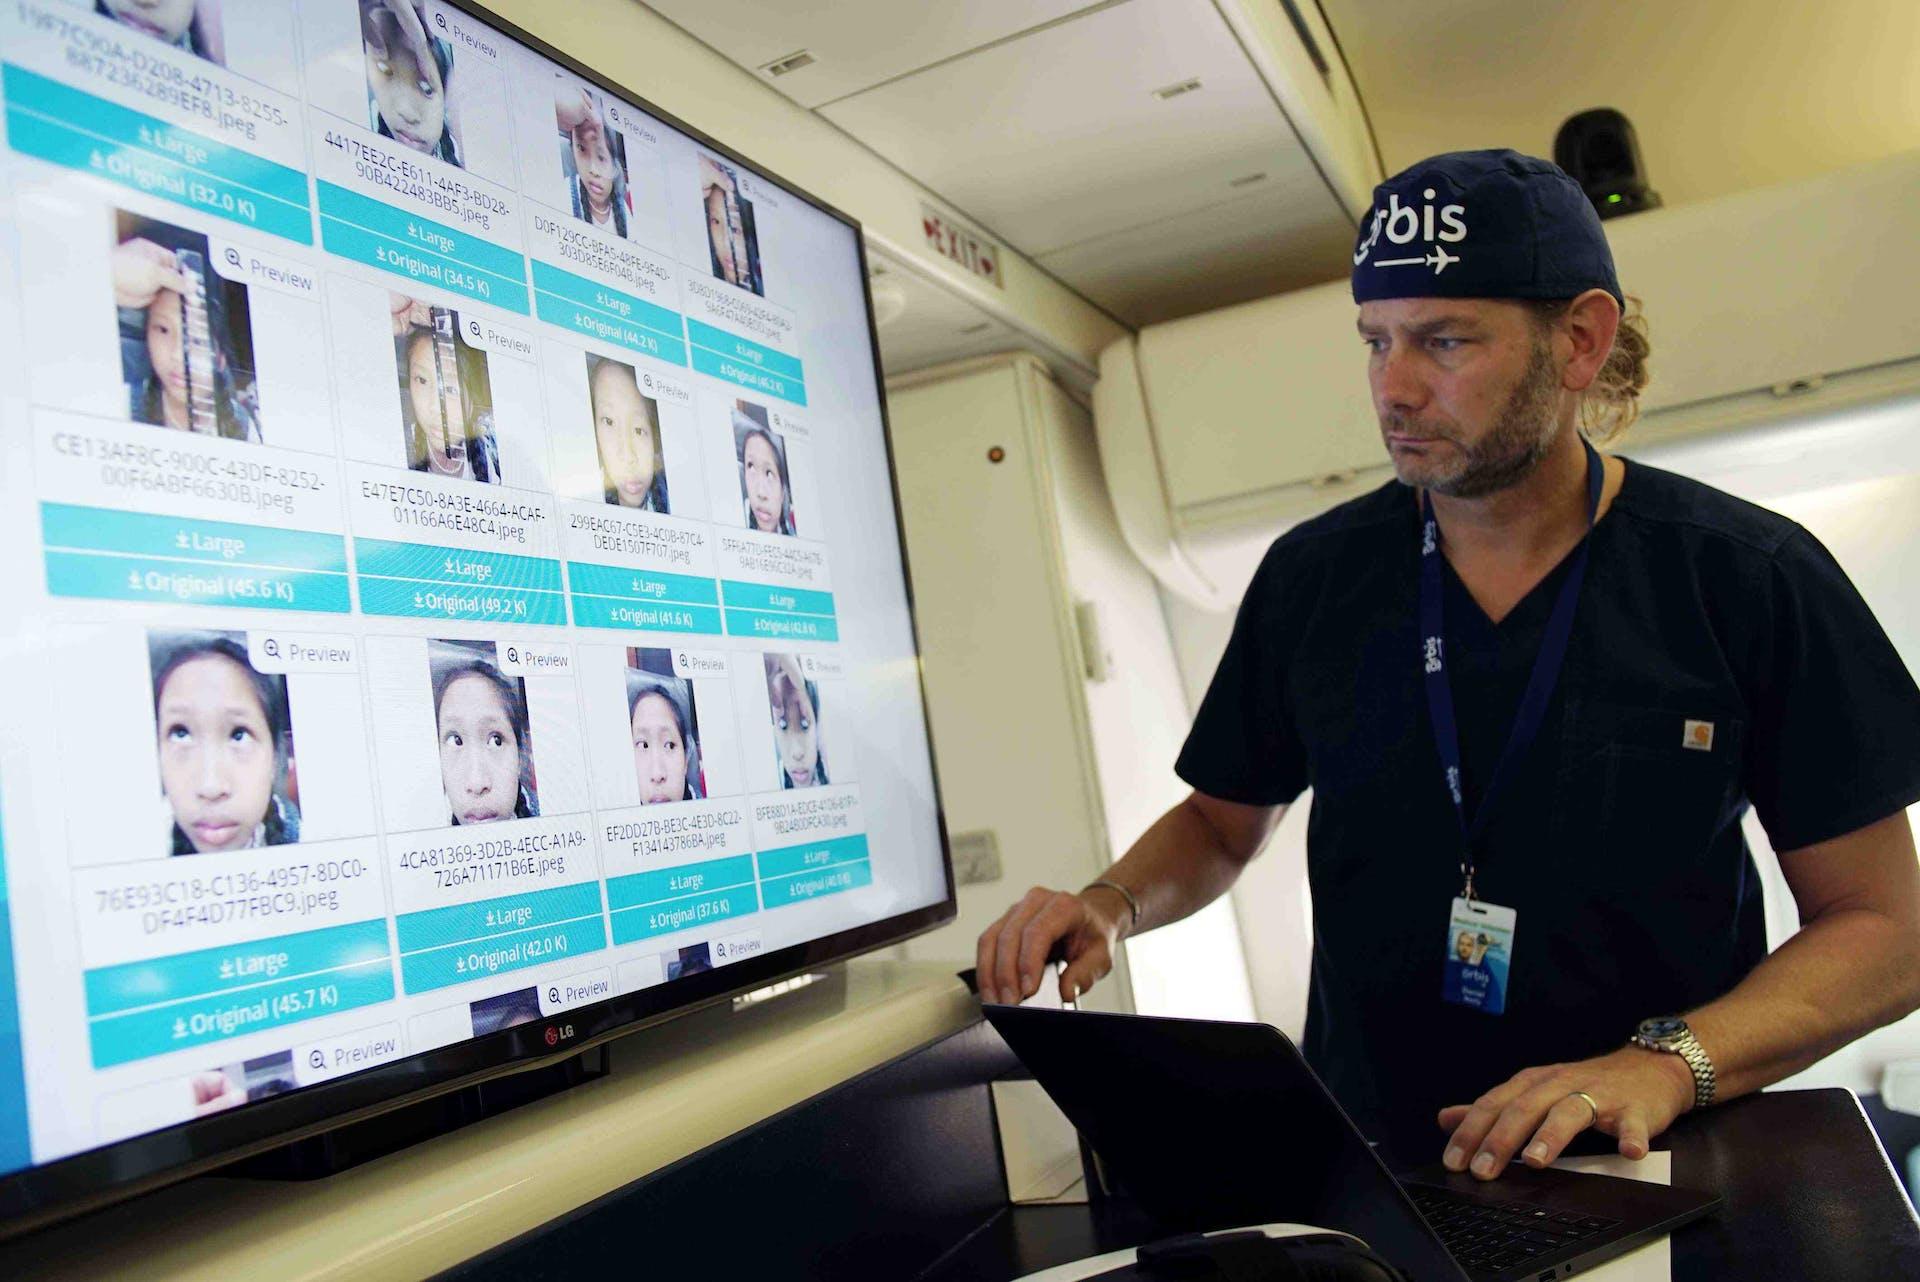 Dr. Daniel Neely using Cybersight to train local eye doctors during a Flying Eye Hospital program